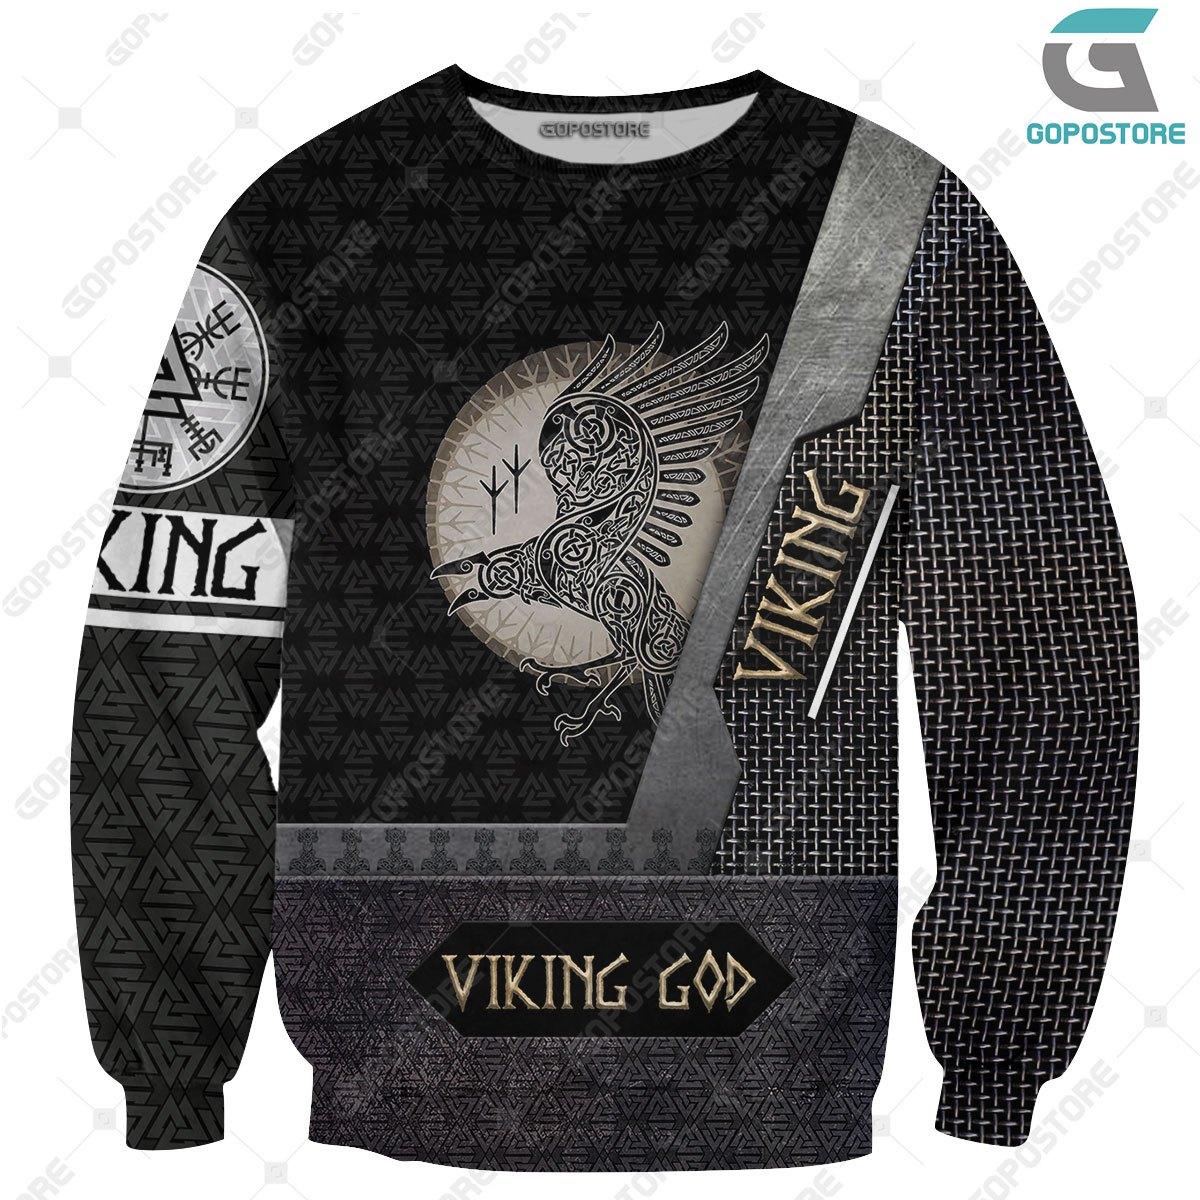 Viking god huginn and muninn full printing sweatshirt